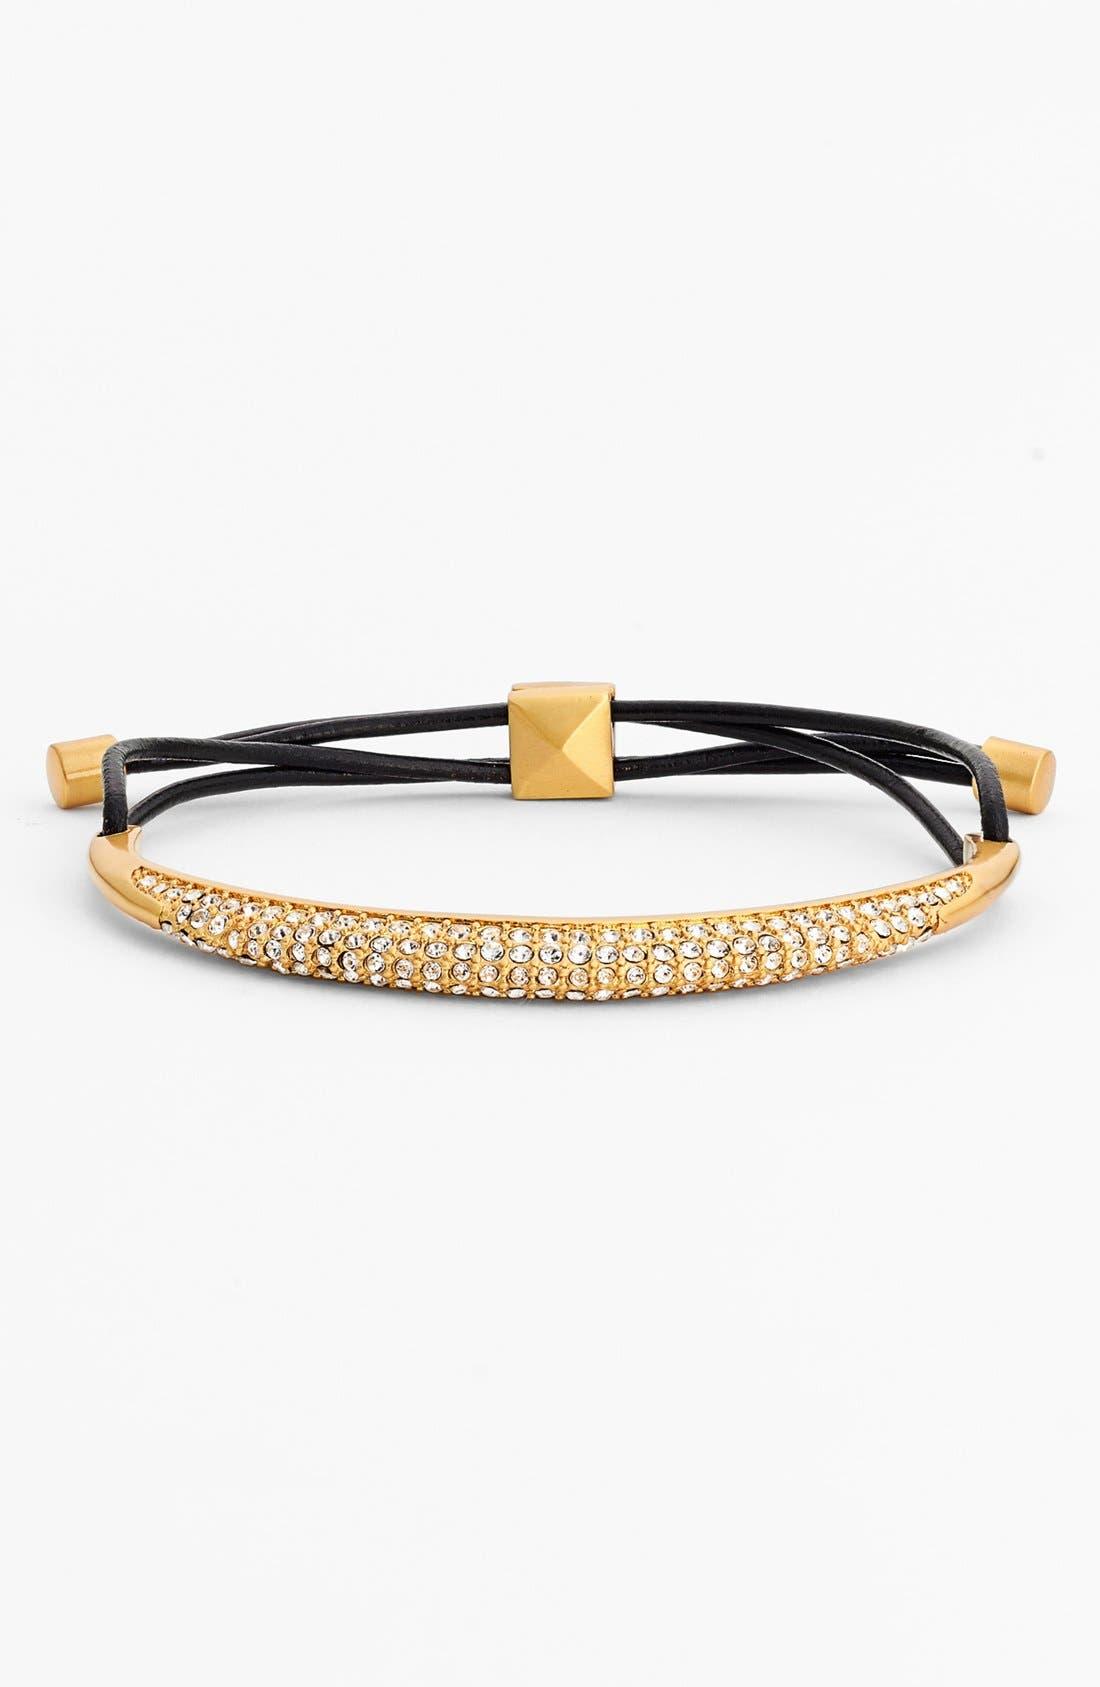 Alternate Image 1 Selected - Vince Camuto 'Caviar Dreams' Pavé Bracelet